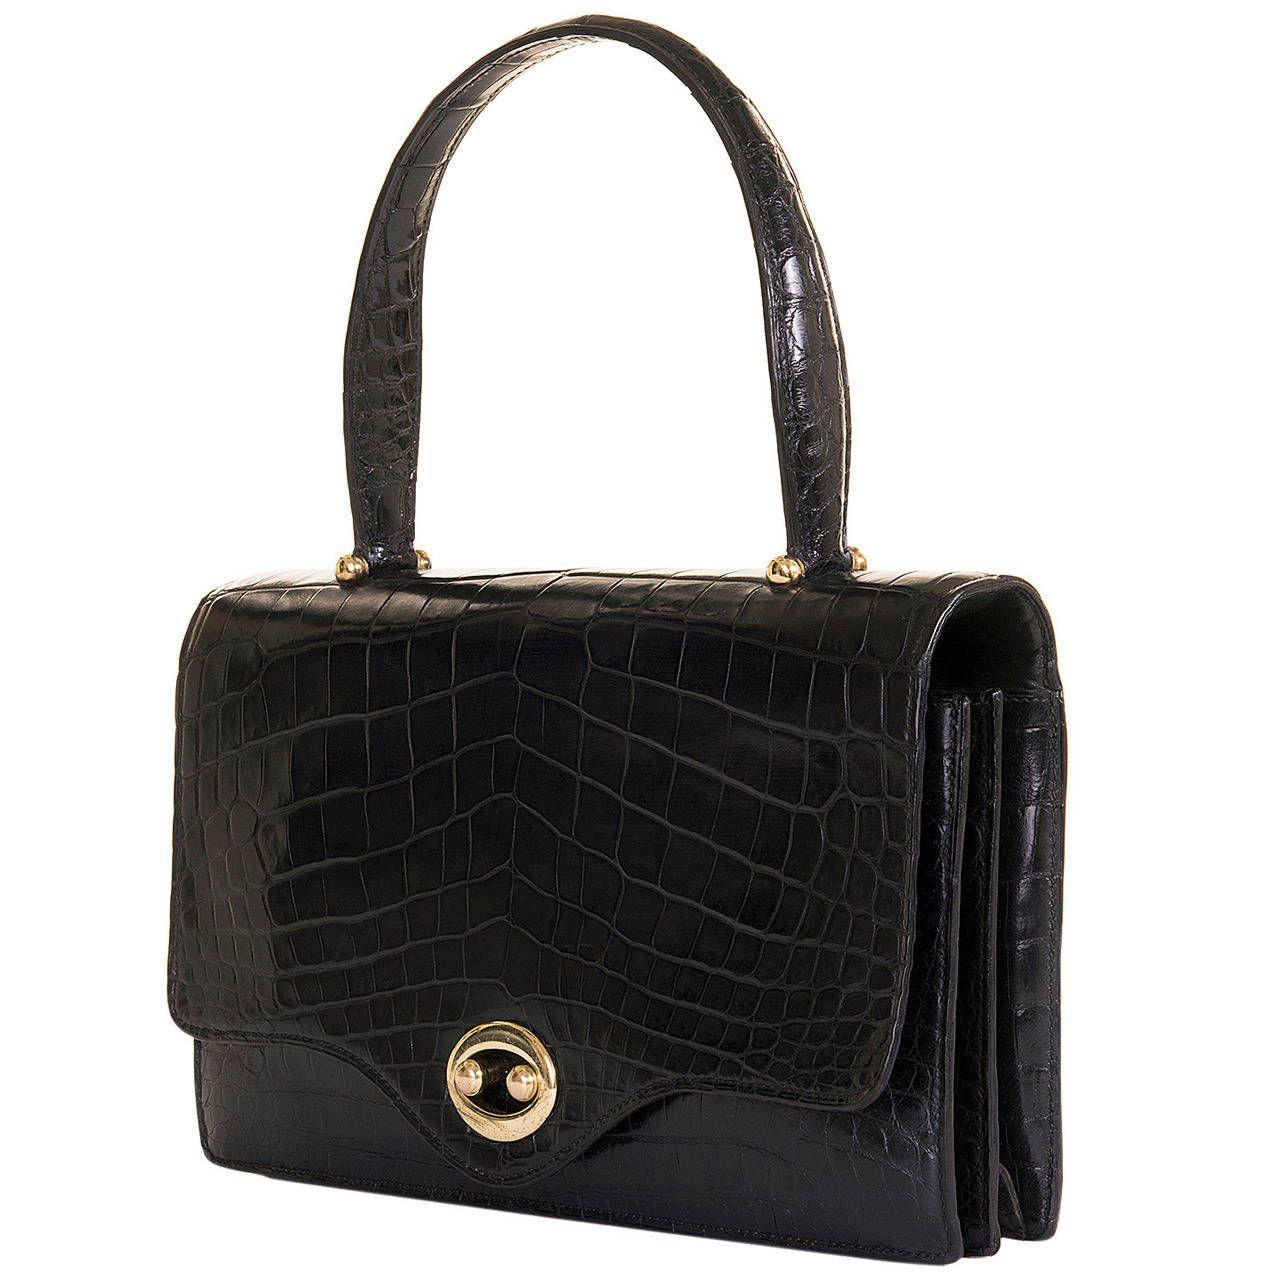 Gucci 60s Rarity Bag In Crocodile YdrPF